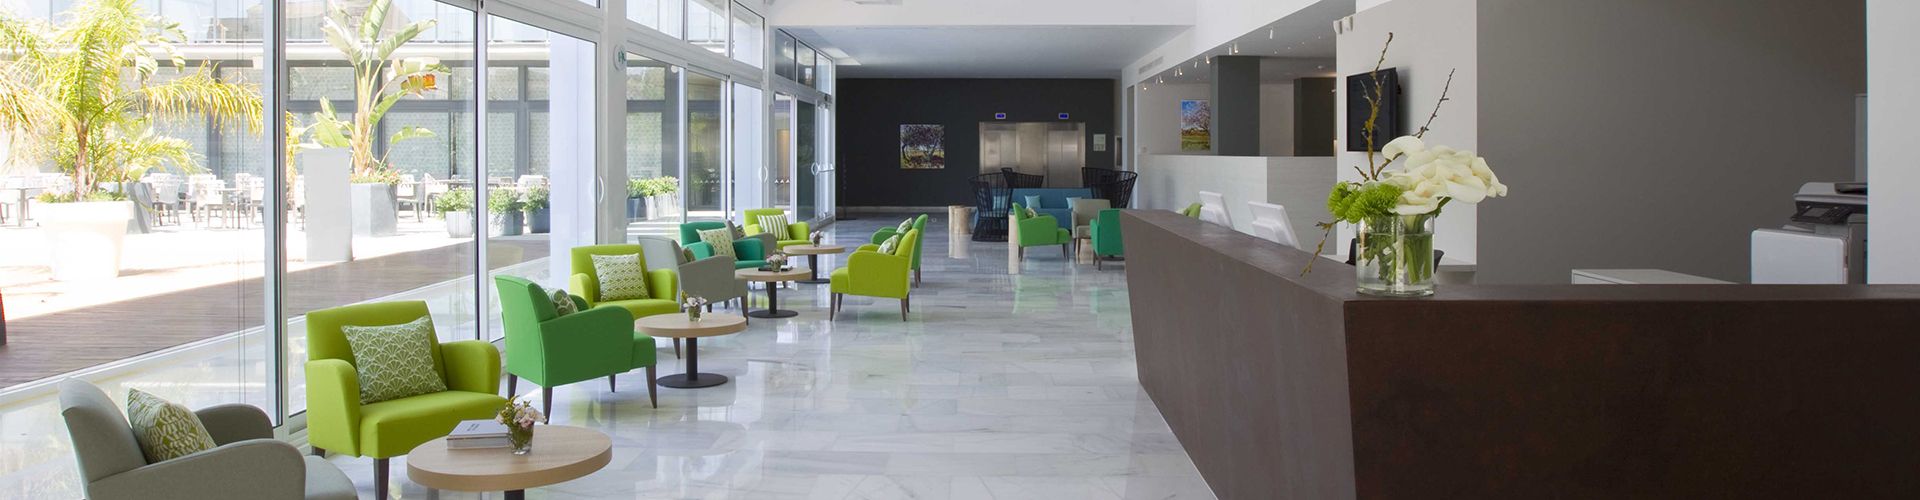 ALTAFULLA MAR HOTEL (4)